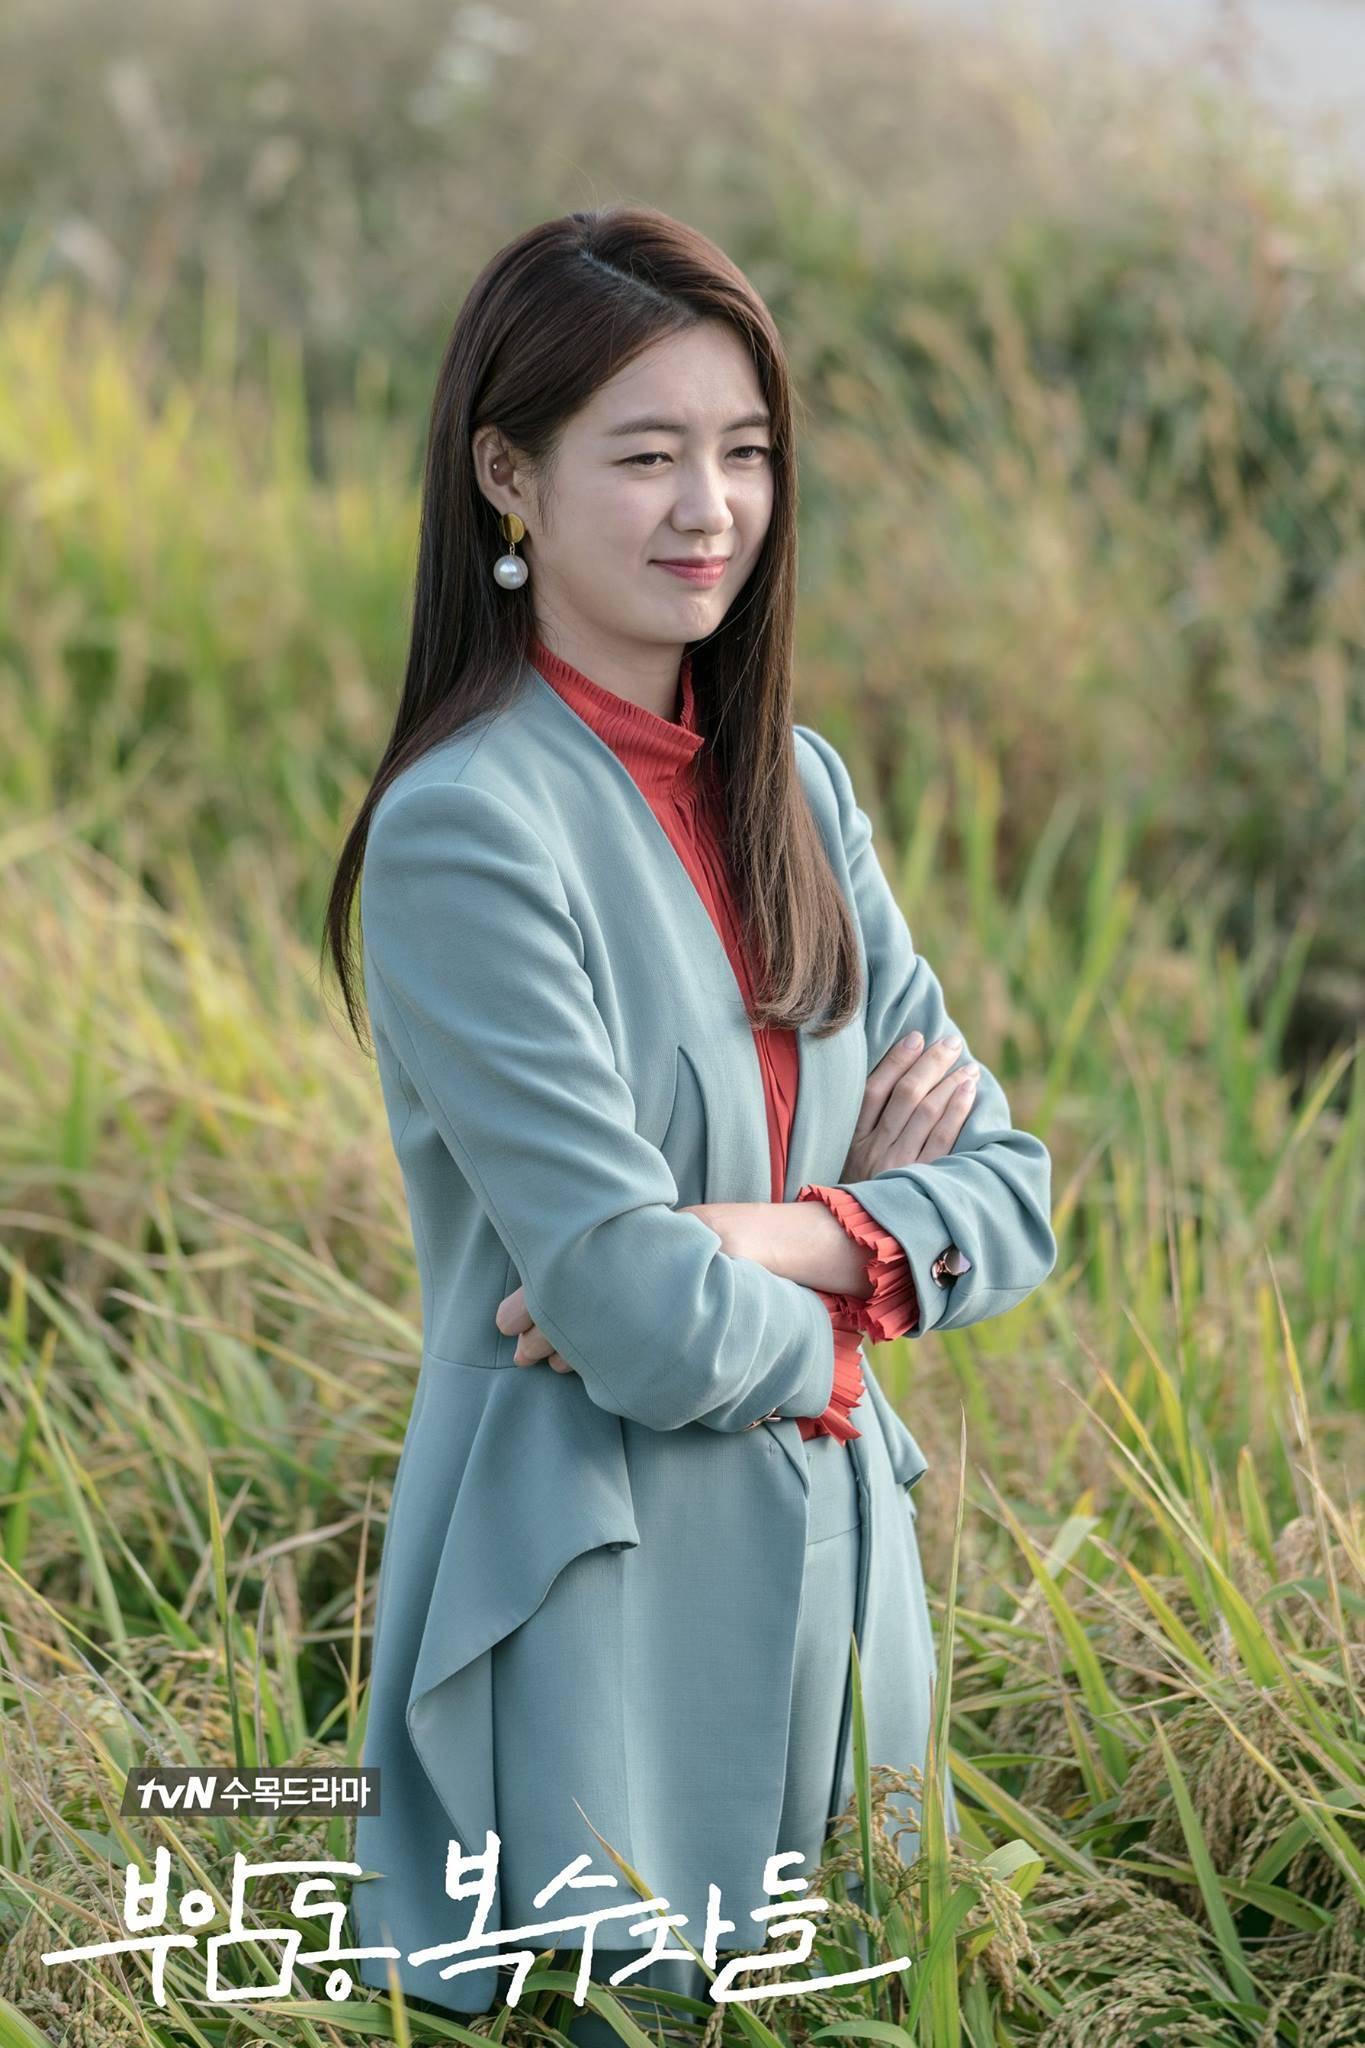 Avengers' Social Club (Korean Drama - 2017) - 부암동 복수자들